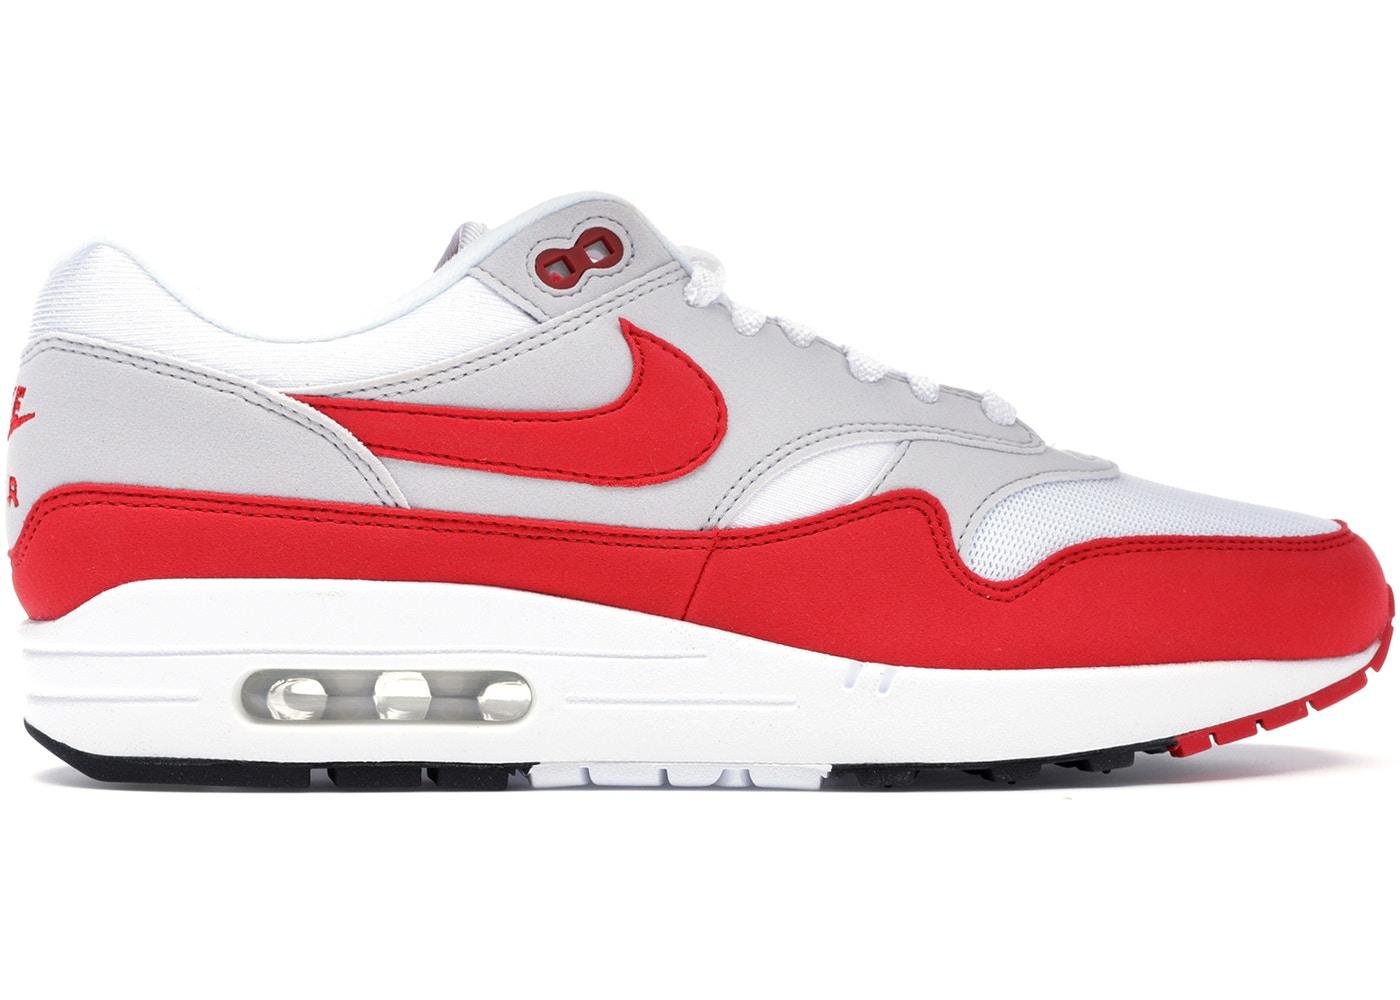 promo code 2baab 3a788 Restock  Nike Air Max 1 OG Anniversary